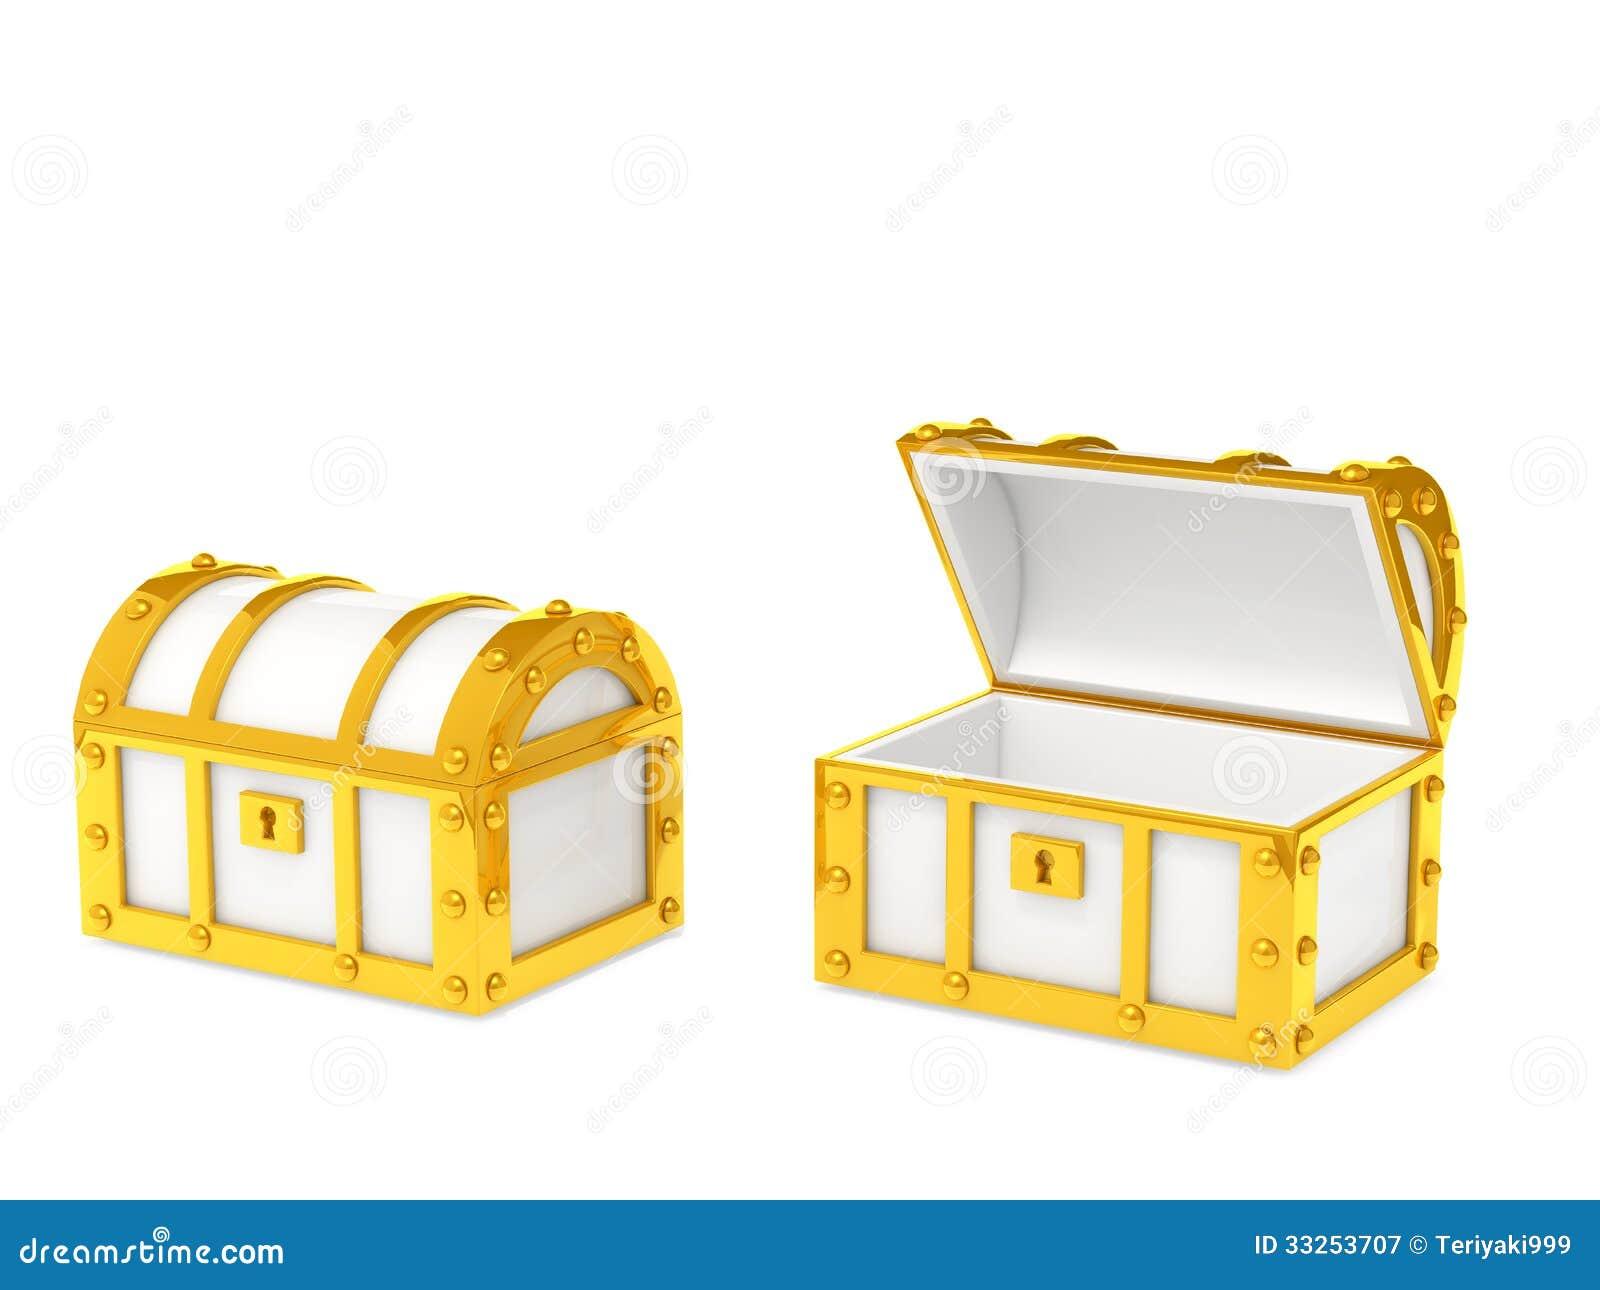 treasure box stock illustration illustration of isolated 33253707